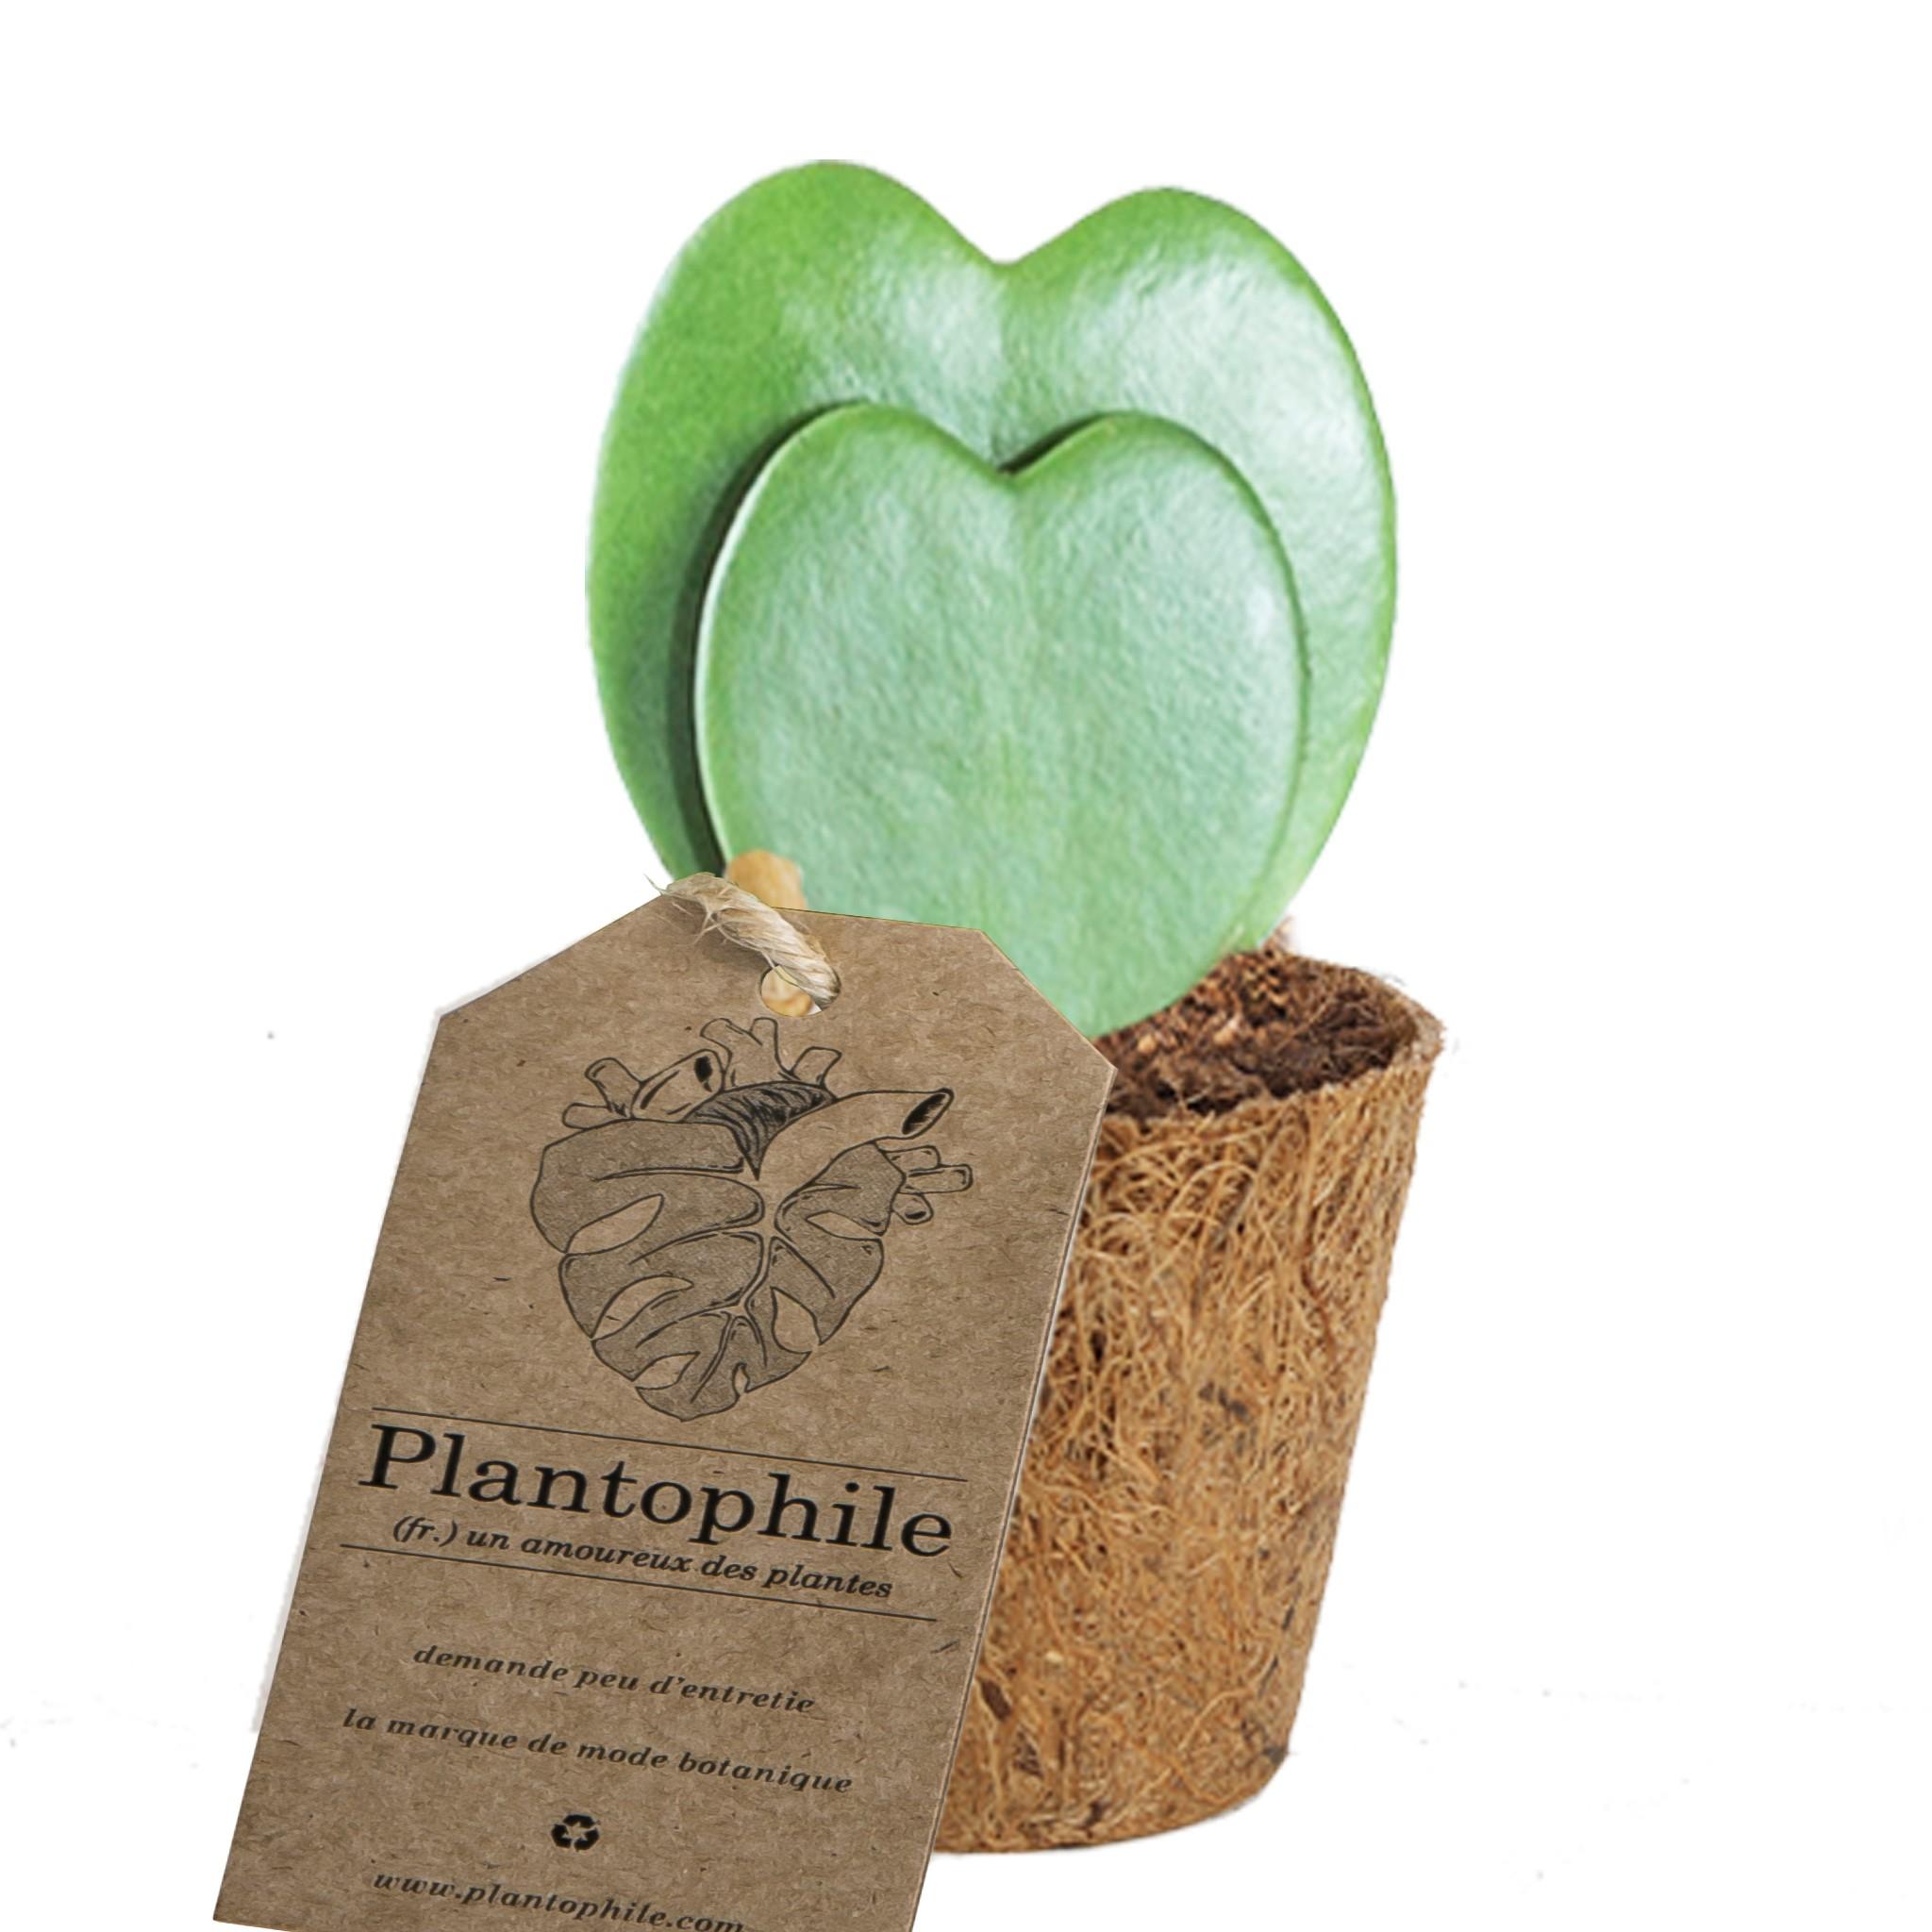 Hoya heart plant in compost pot